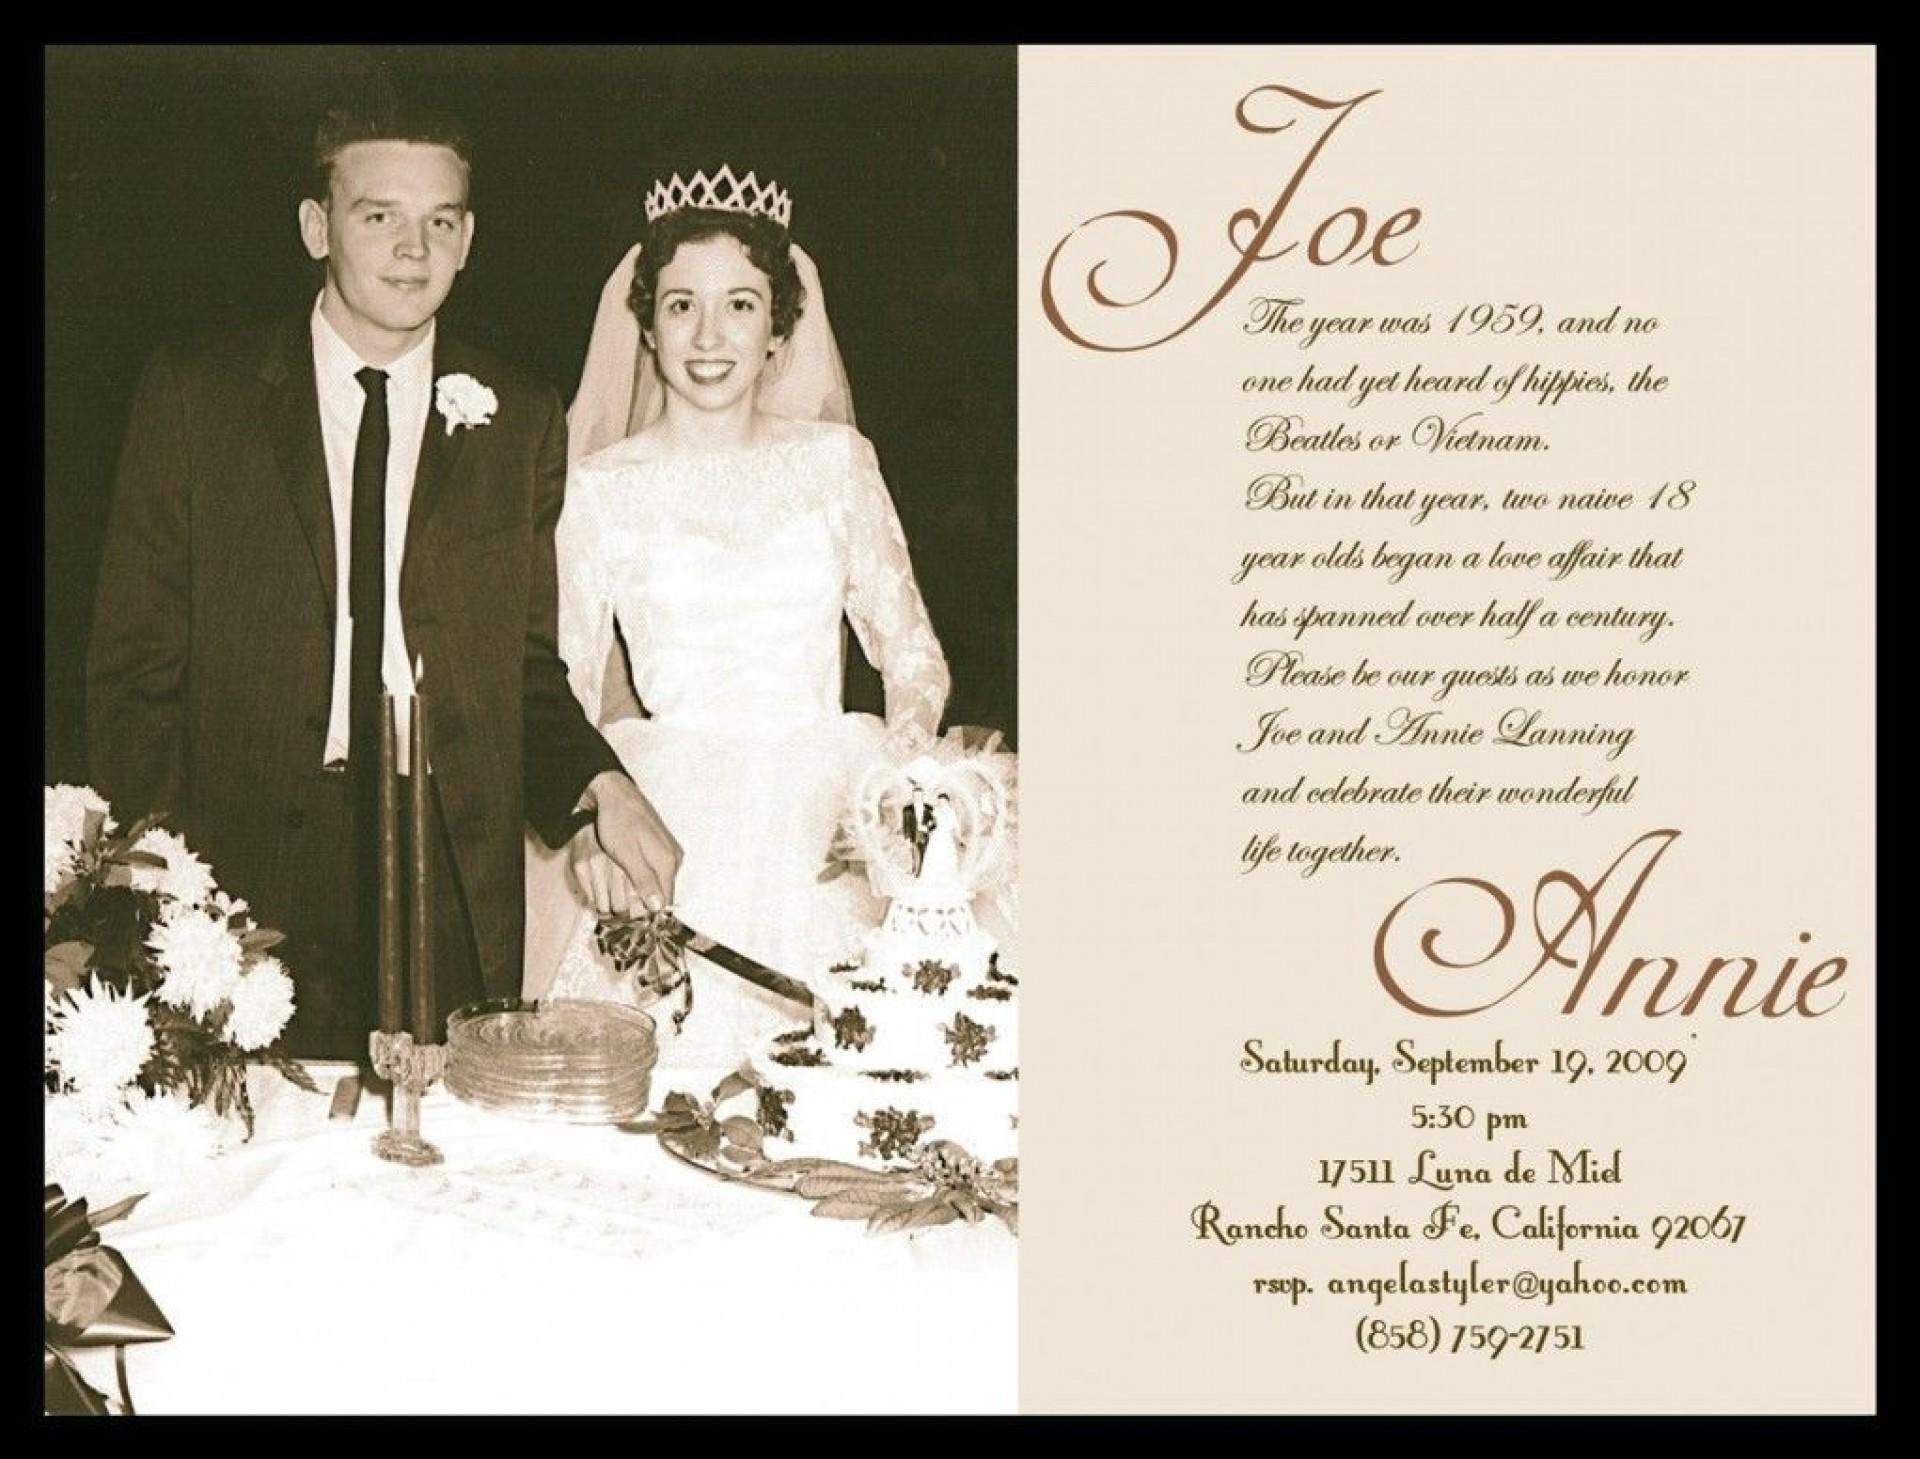 005 Shocking 50th Wedding Anniversary Invitation Card Sample Image  Wording1920